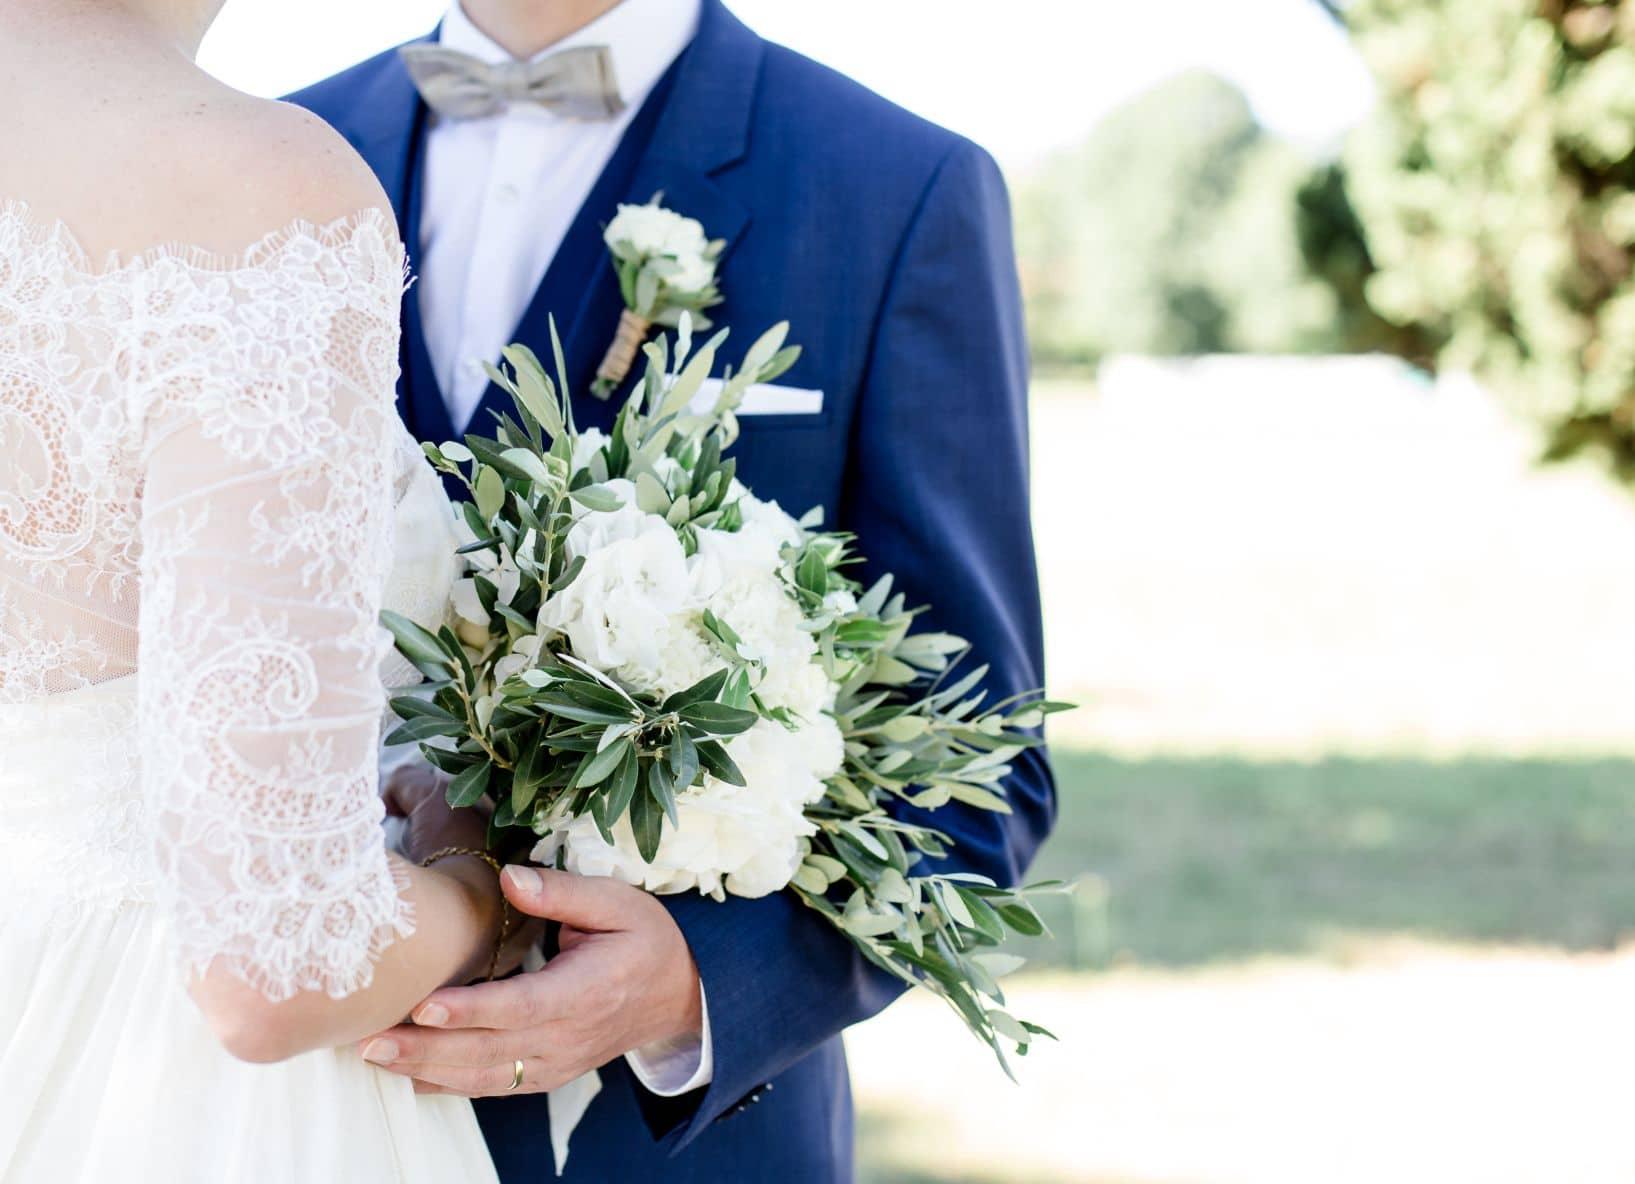 Million Memories_A&D_Hochzeitsfotograf_Schlosshochzeit_Toskana_Lago Di Como_Wedding_Tuscany_098